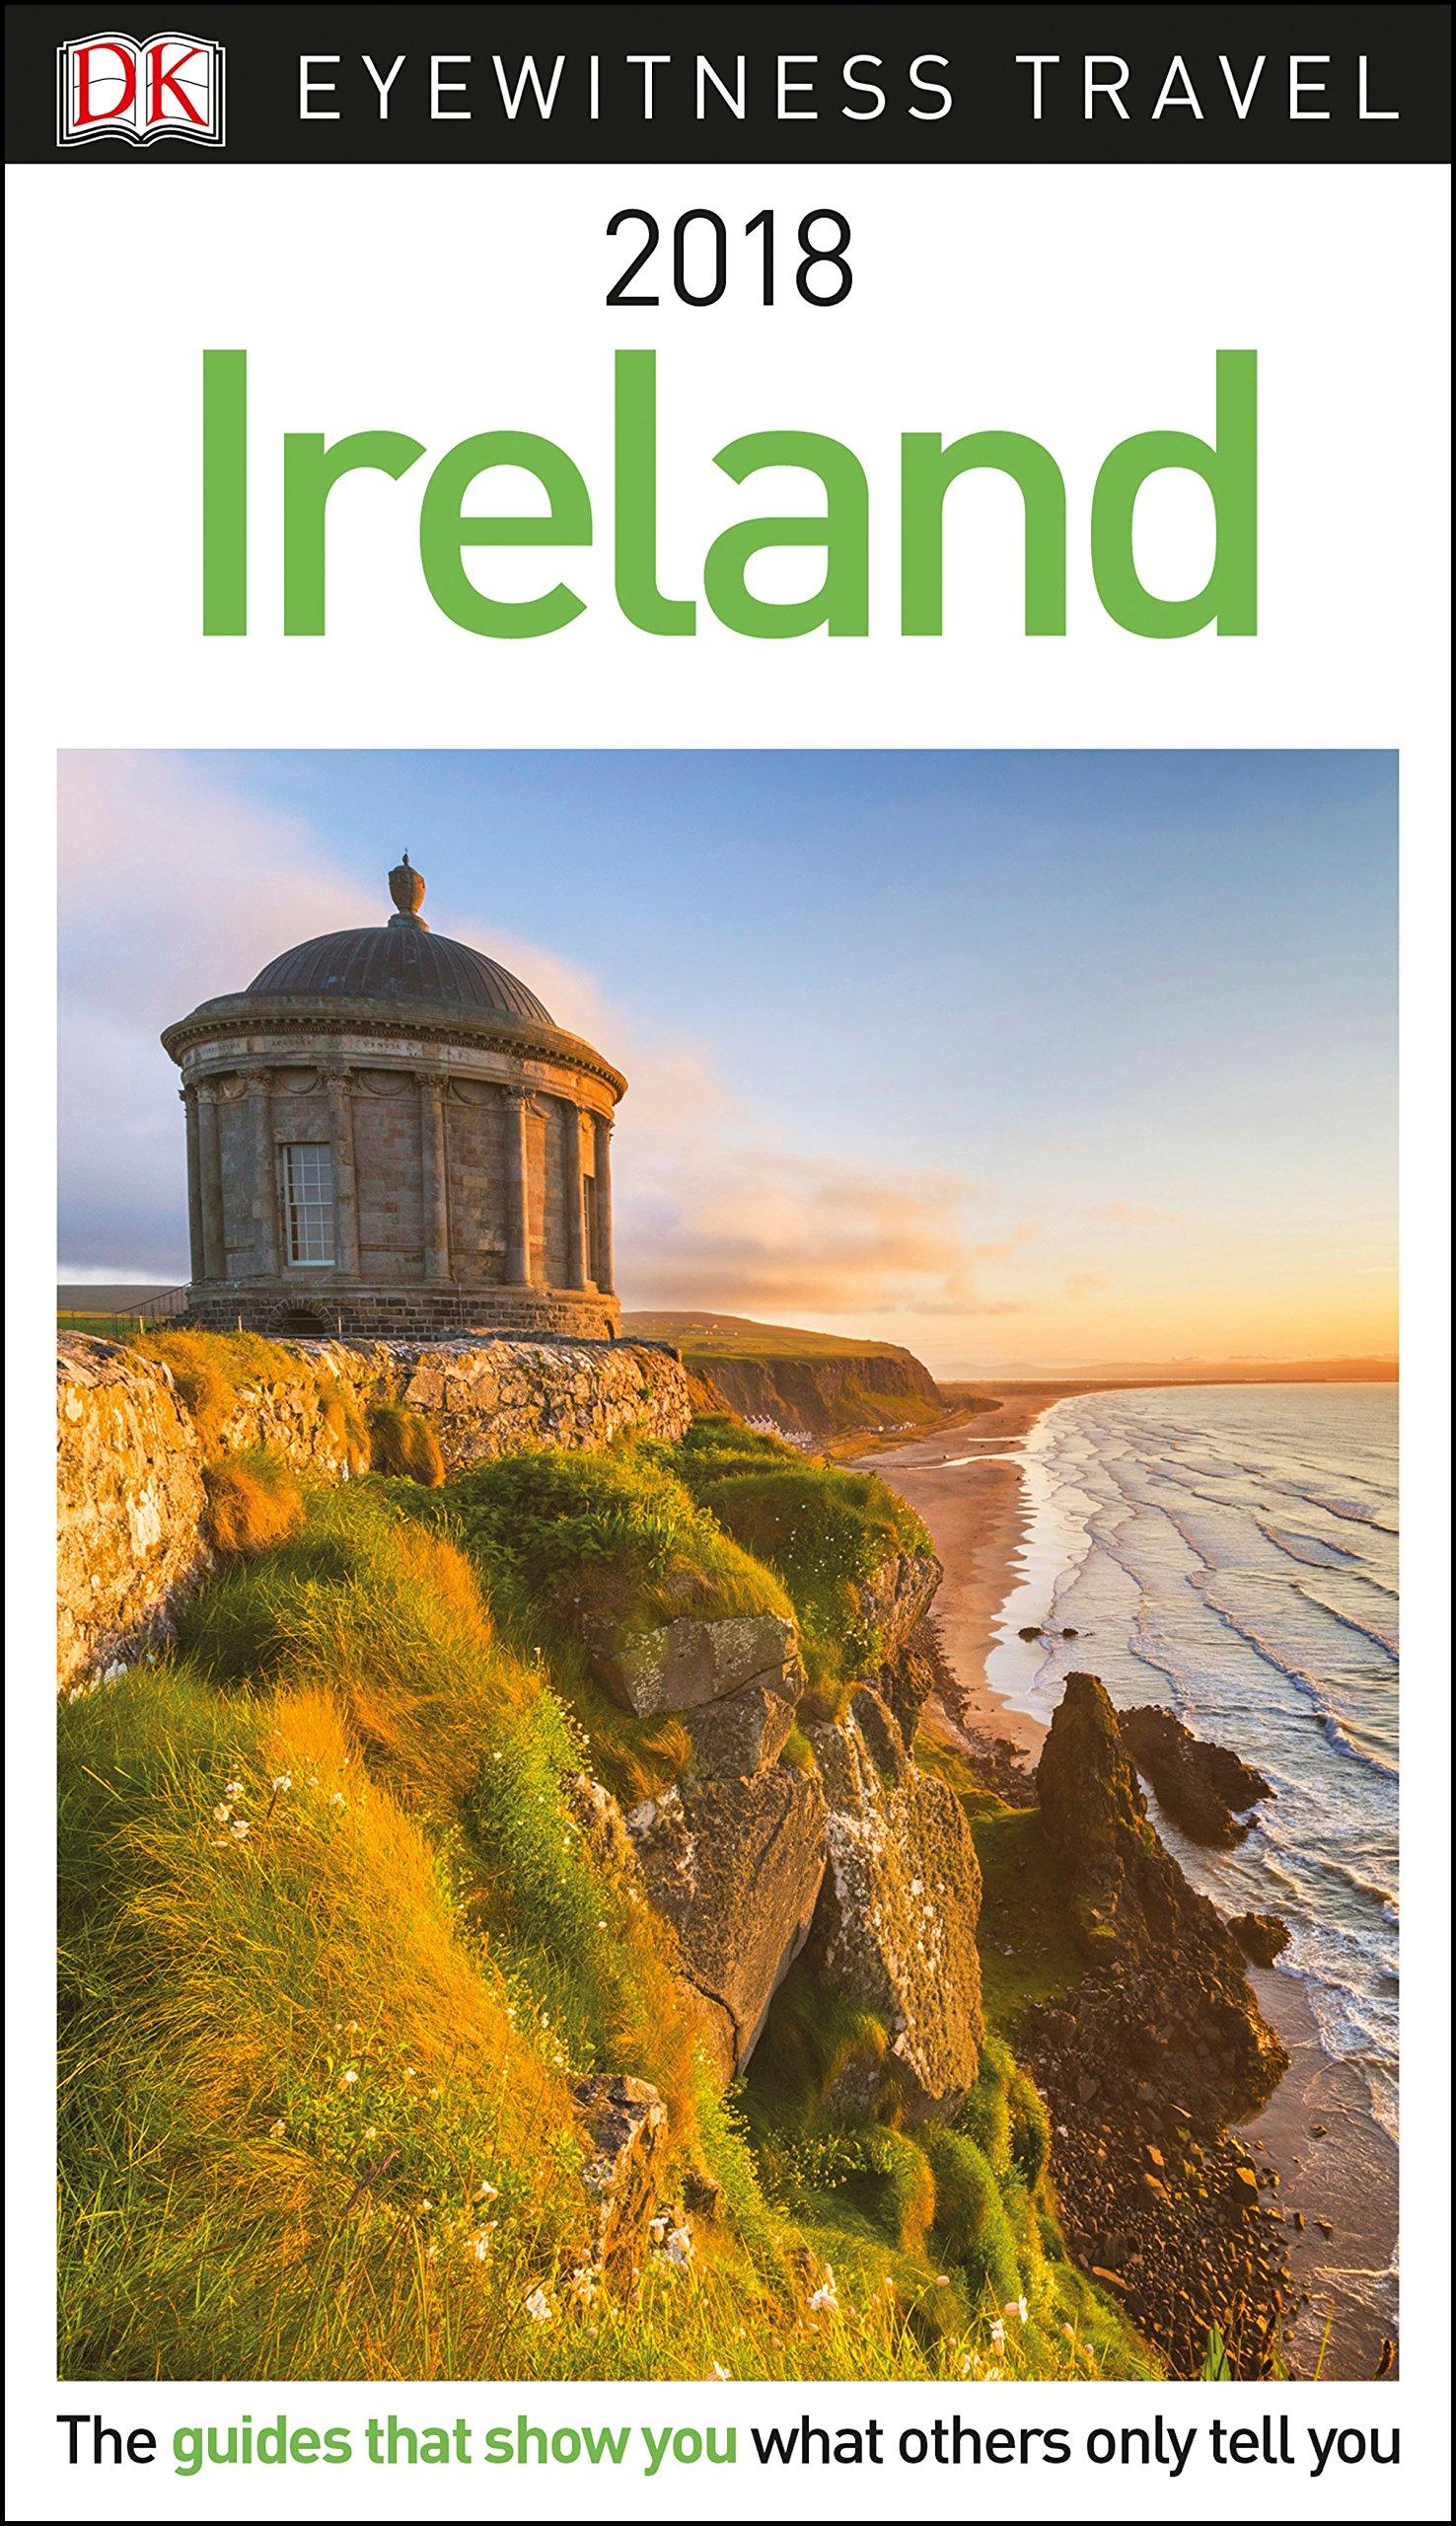 DK Eyewitness Travel Guide Ireland: 2018: 9780241277287: Amazon.com: Books